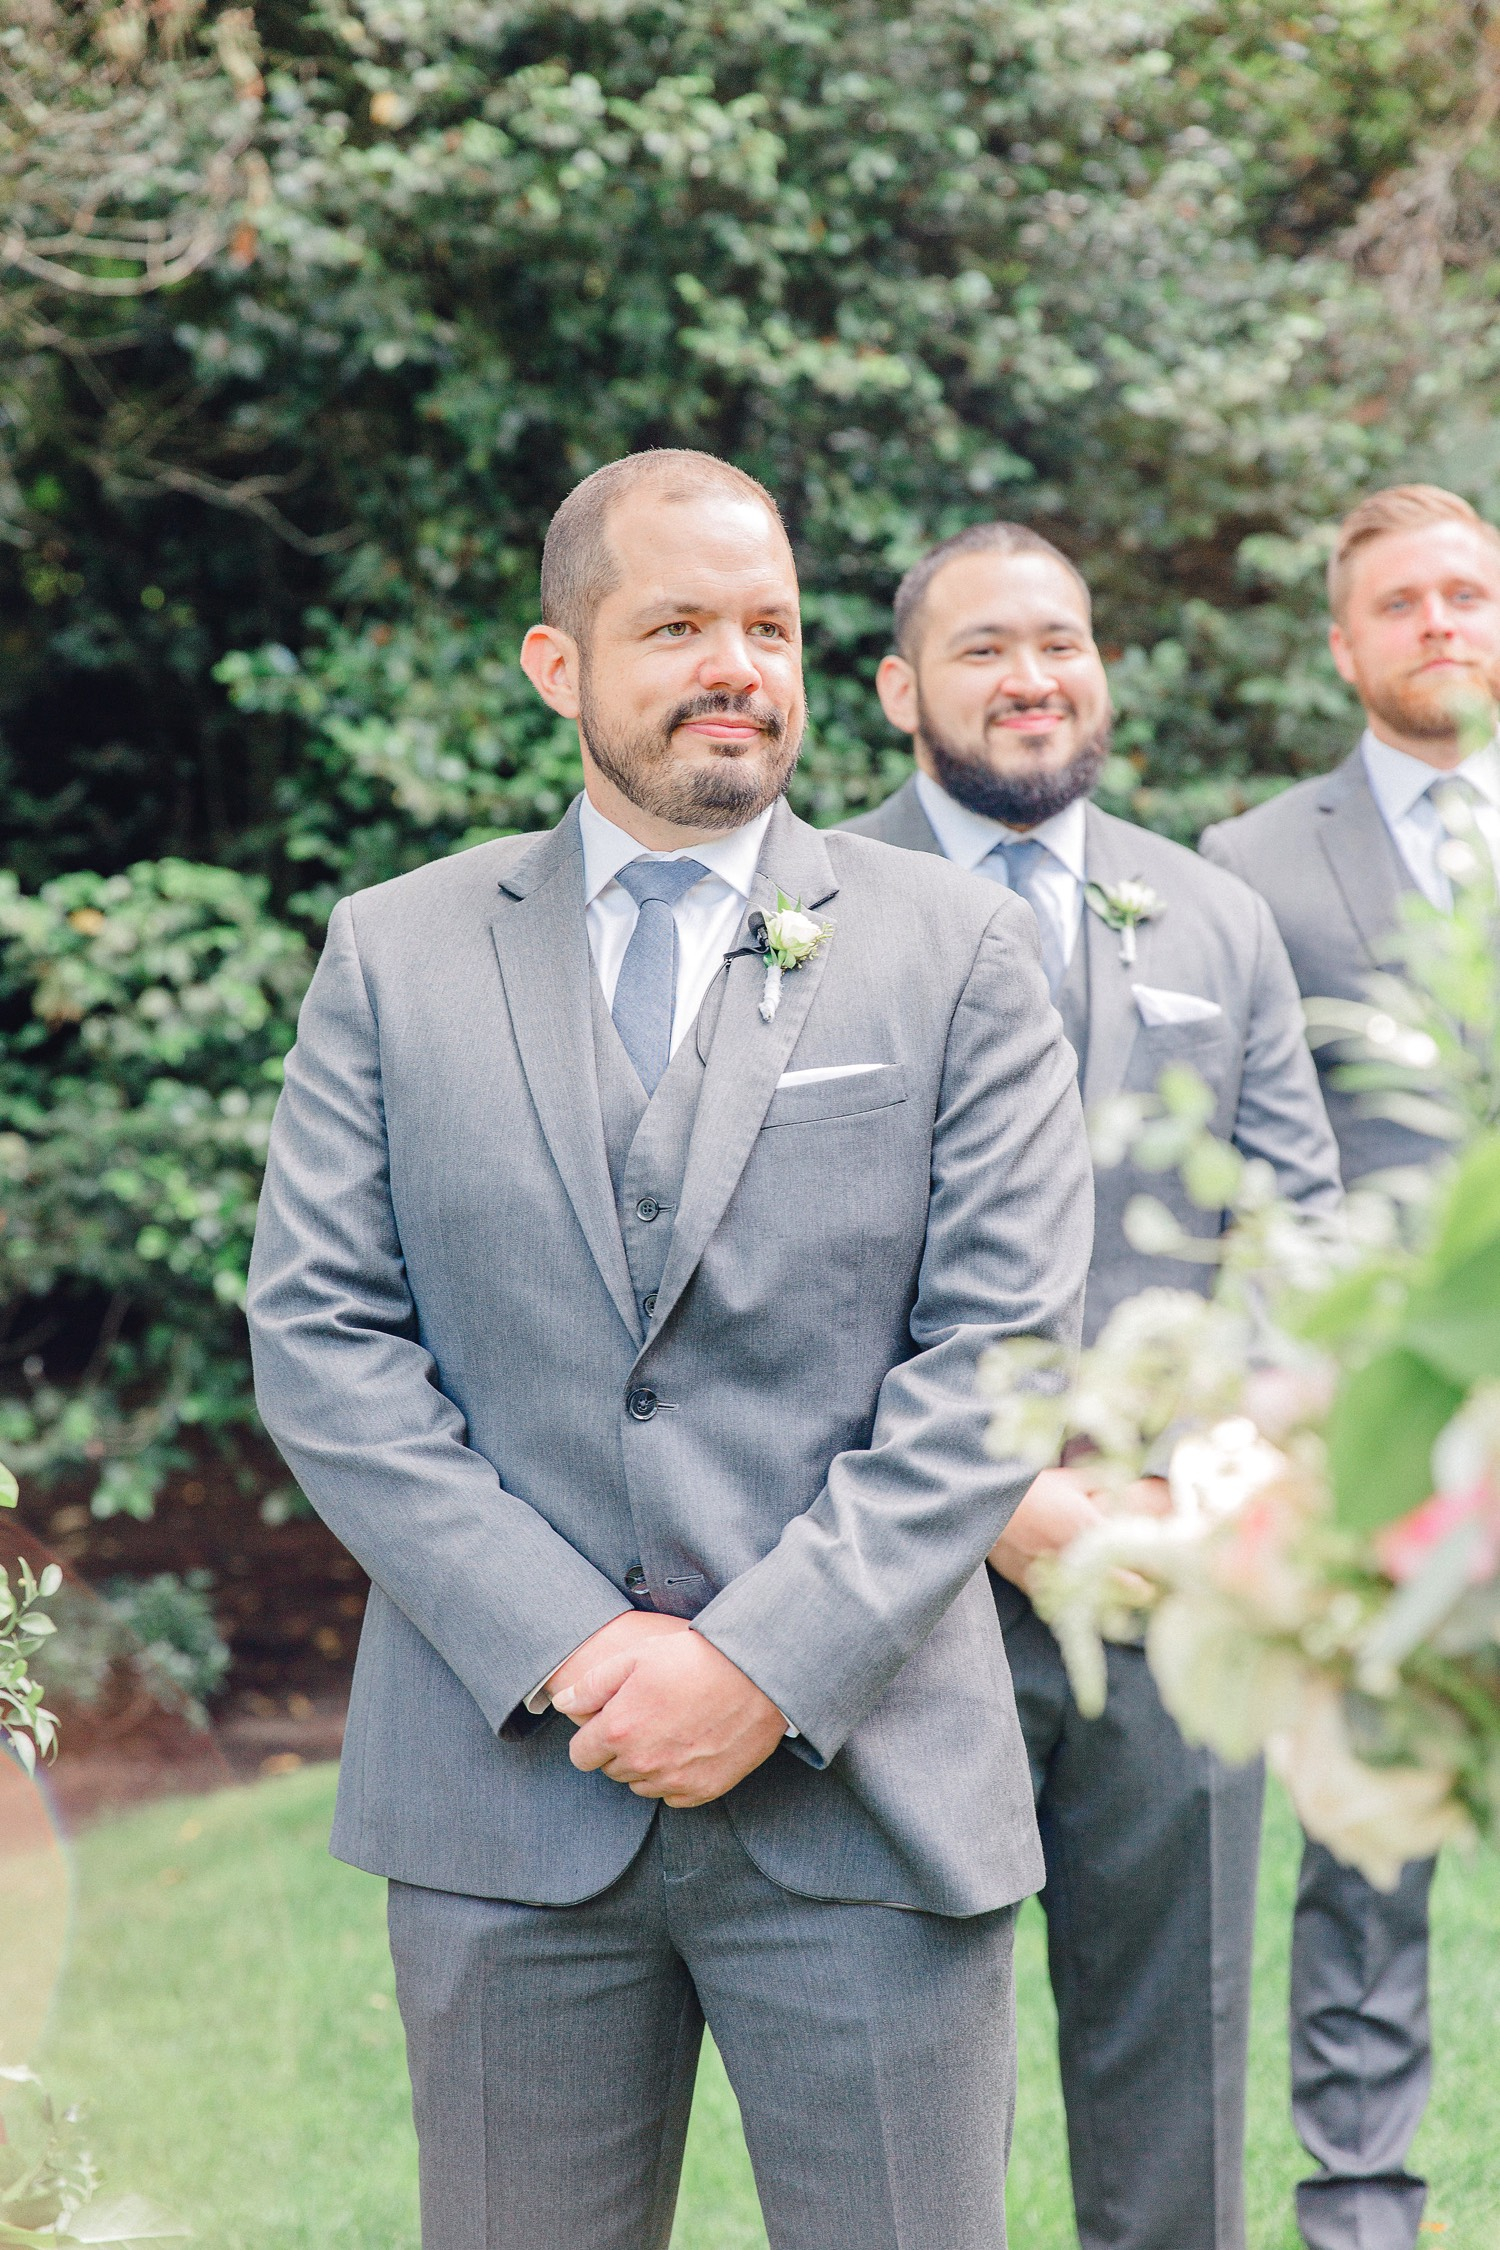 0000000000054_emmarosecompany_katiematt-9705_Photographer_PNW_House_Robinswood_Emma_Light_Company_Airy_Rose_and_Wedding_Seattle.jpg